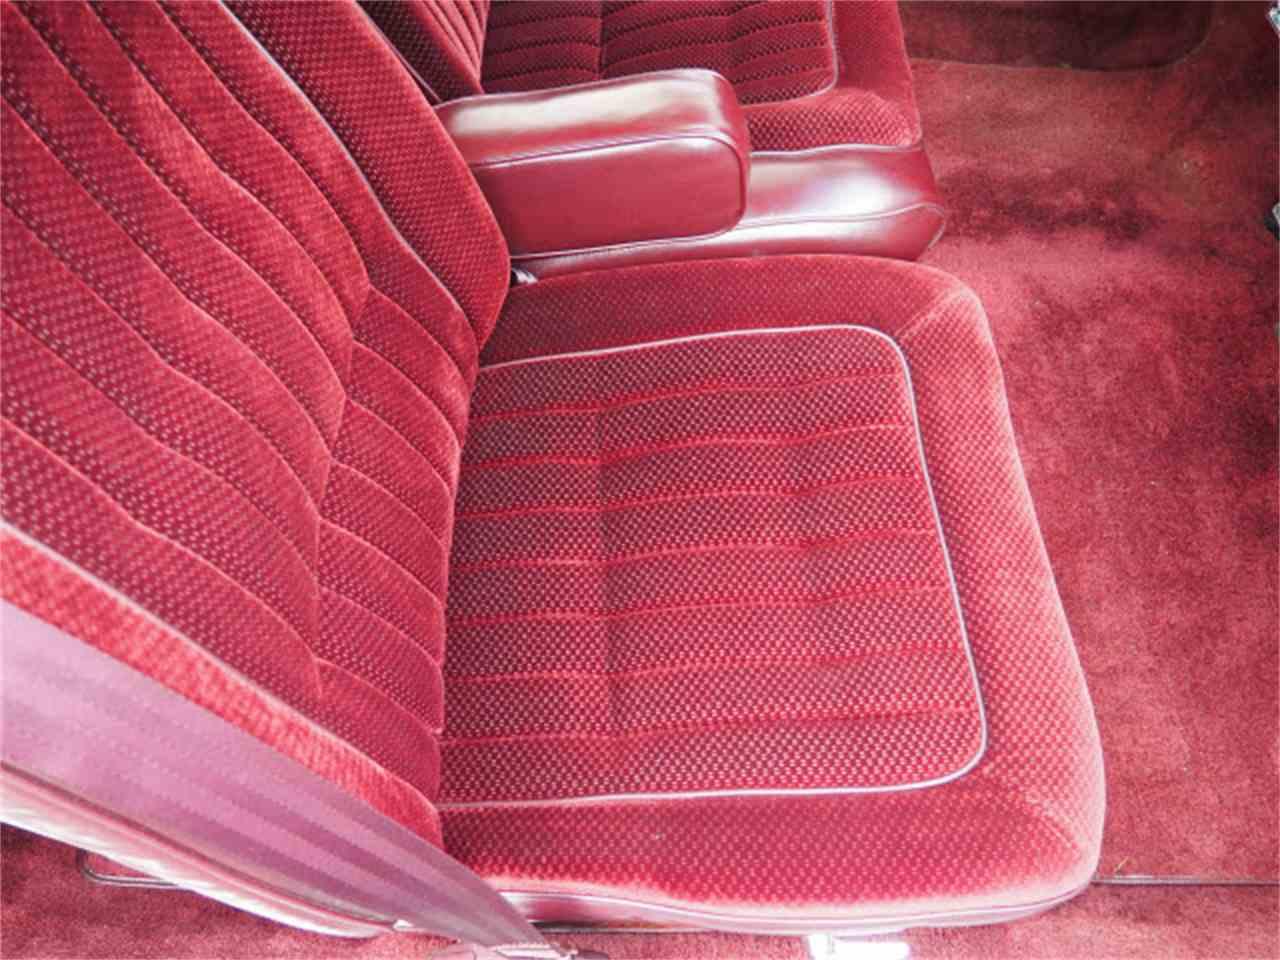 Large Picture of '85 Toronado - $15,999.00 - LUQO